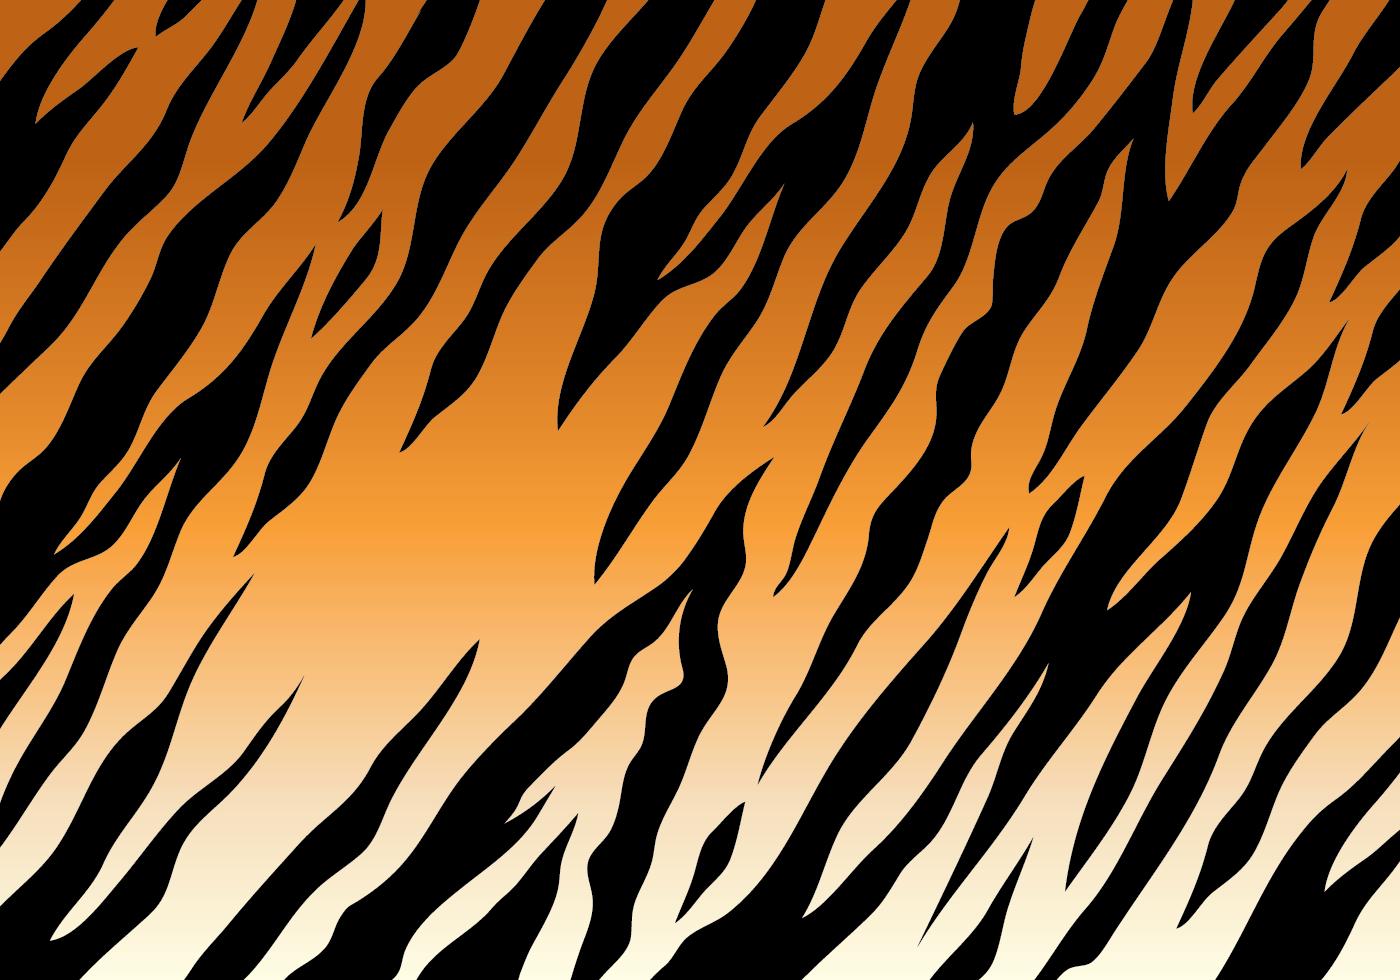 Tiger Stripe Background